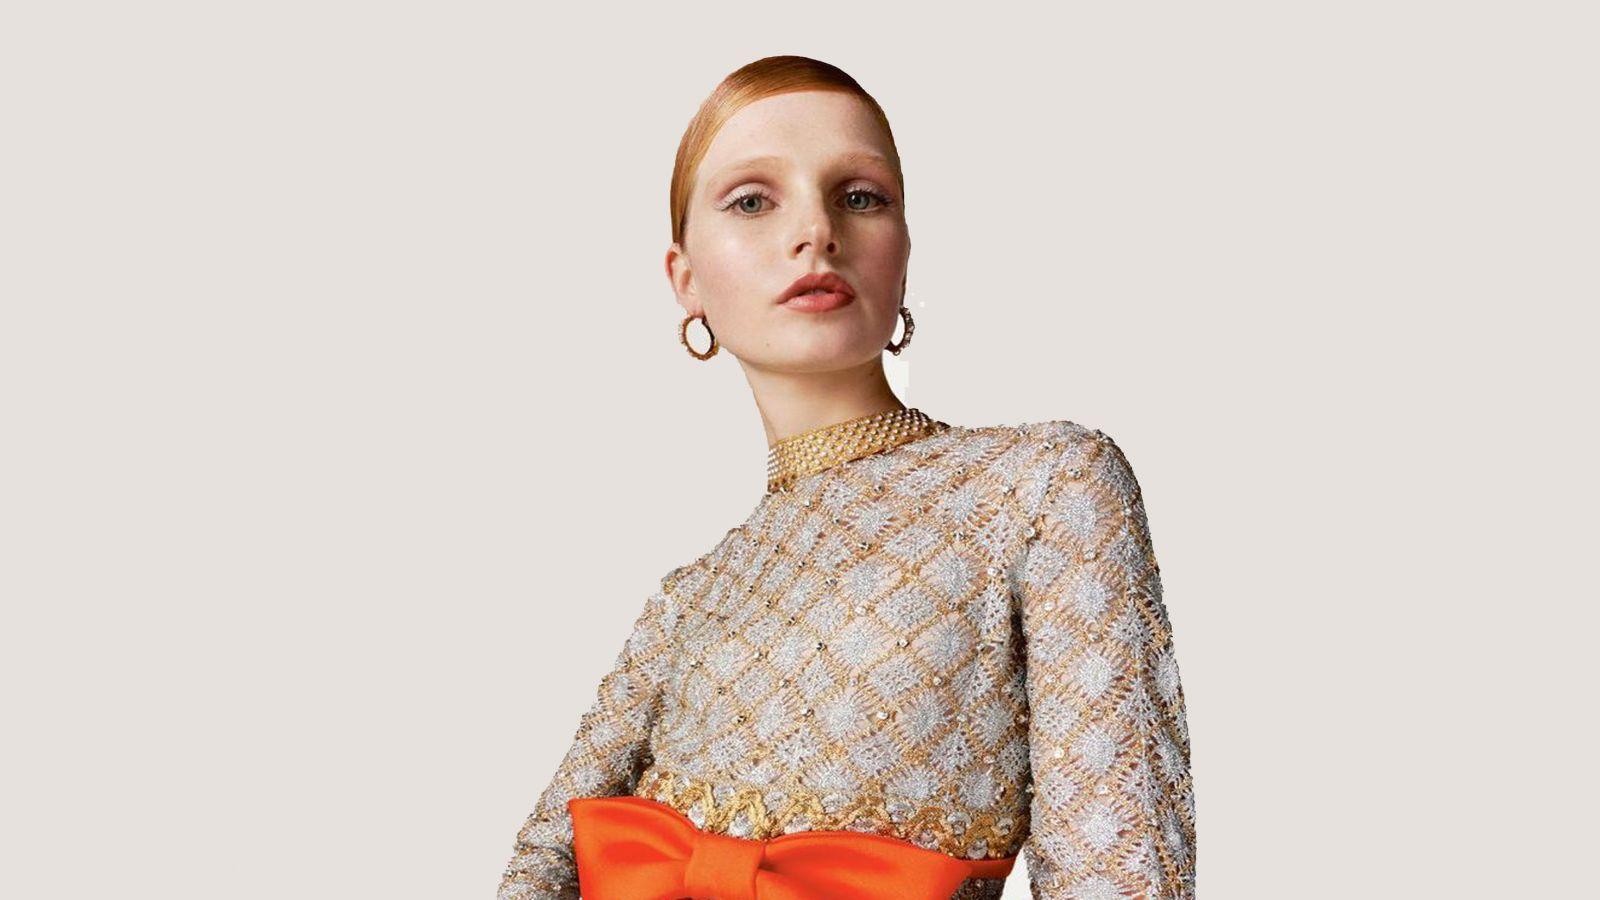 Miu Miu: Η capsule συλλογή του οίκου από ανακυκλωμένα vintage φορέματα συνοψίζει τη μεγαλύτερη τάση του 2020